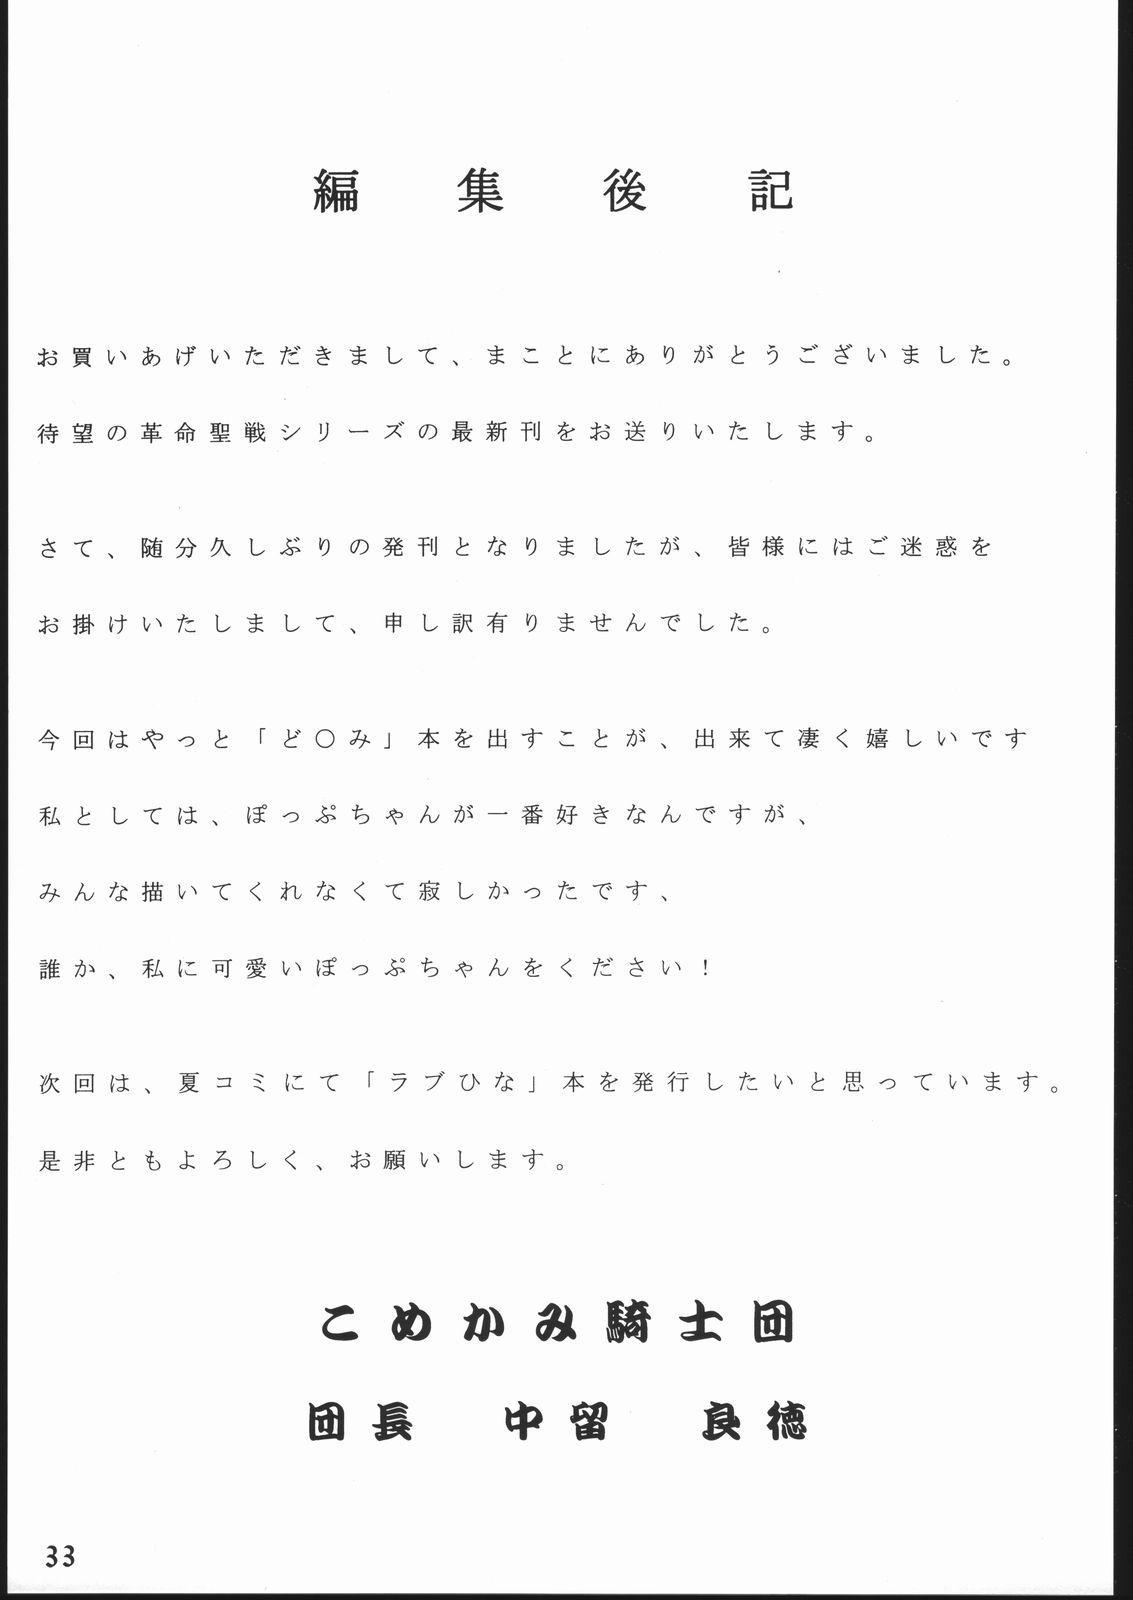 Kakumei Seisen Dai Go Gou 31